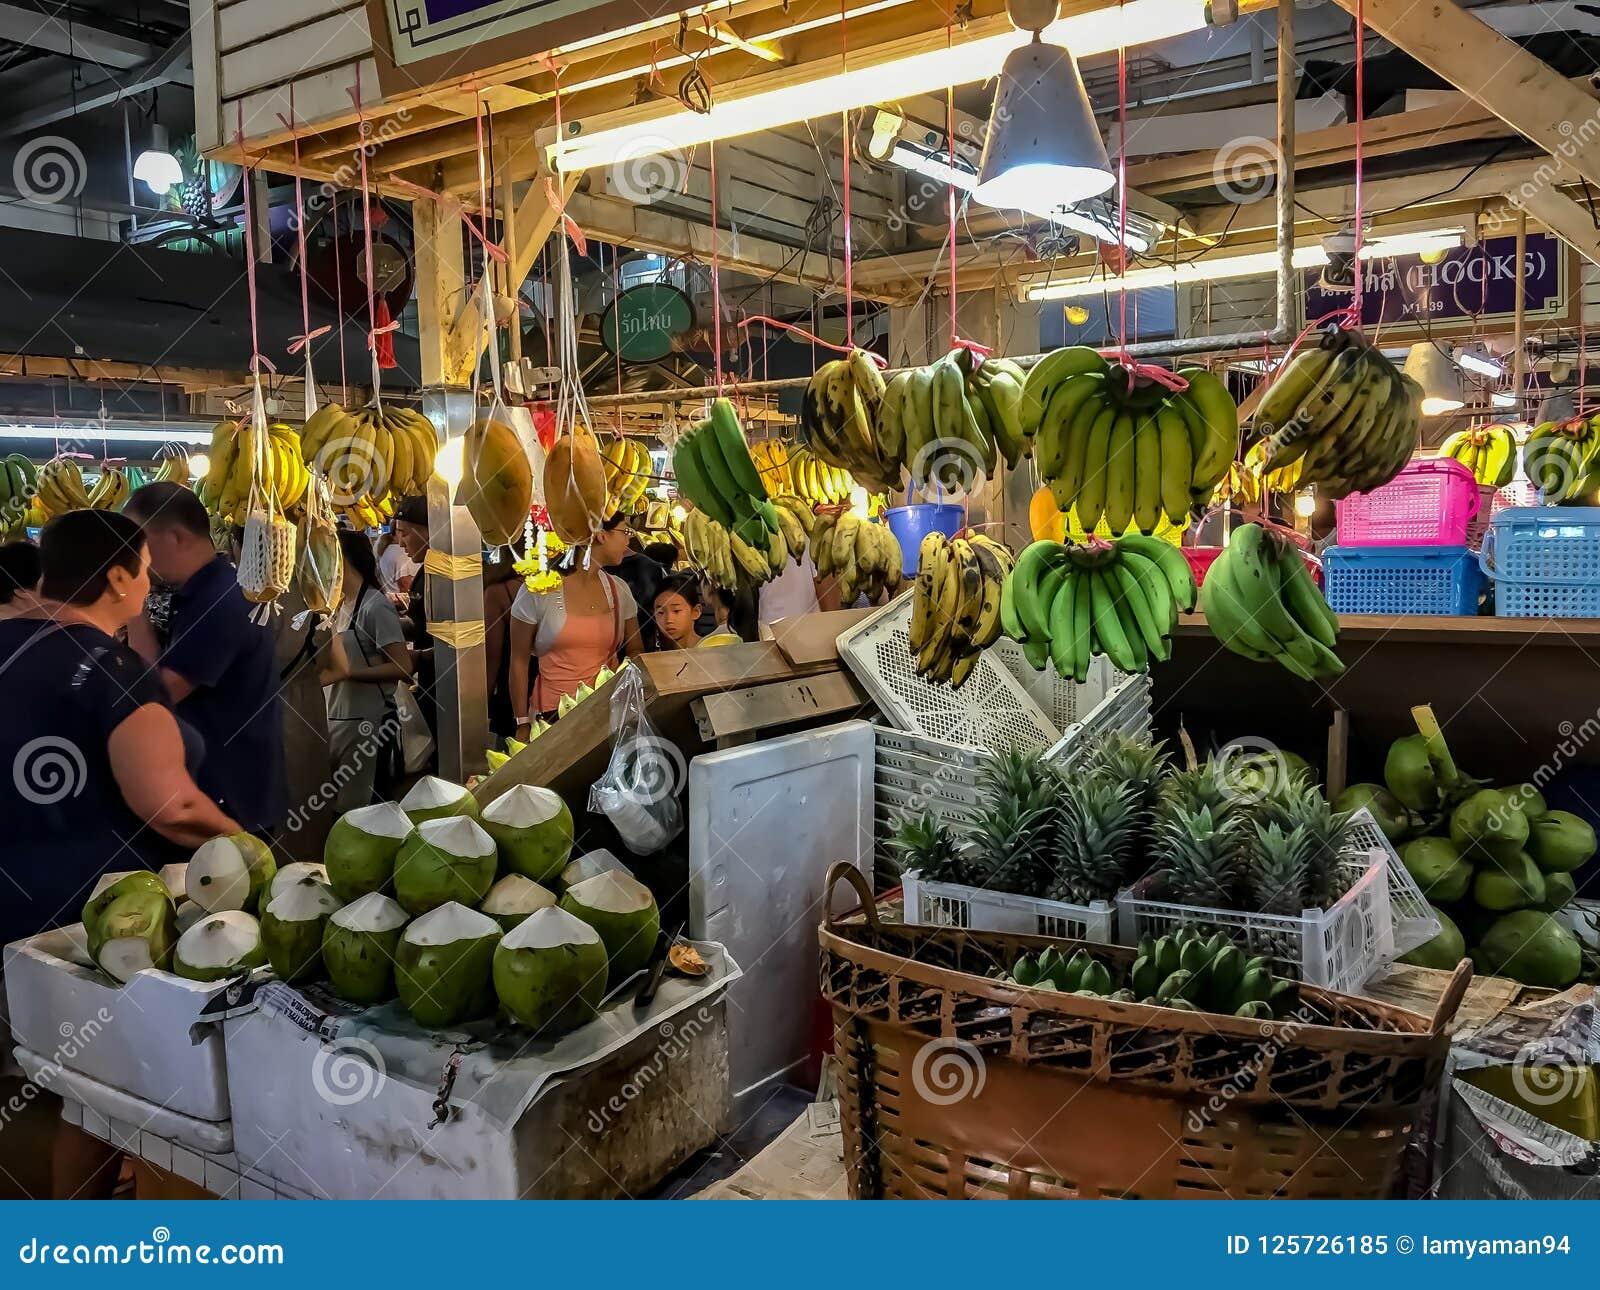 Bannanas和椰子待售在Bansaan夜市场, Patong P上